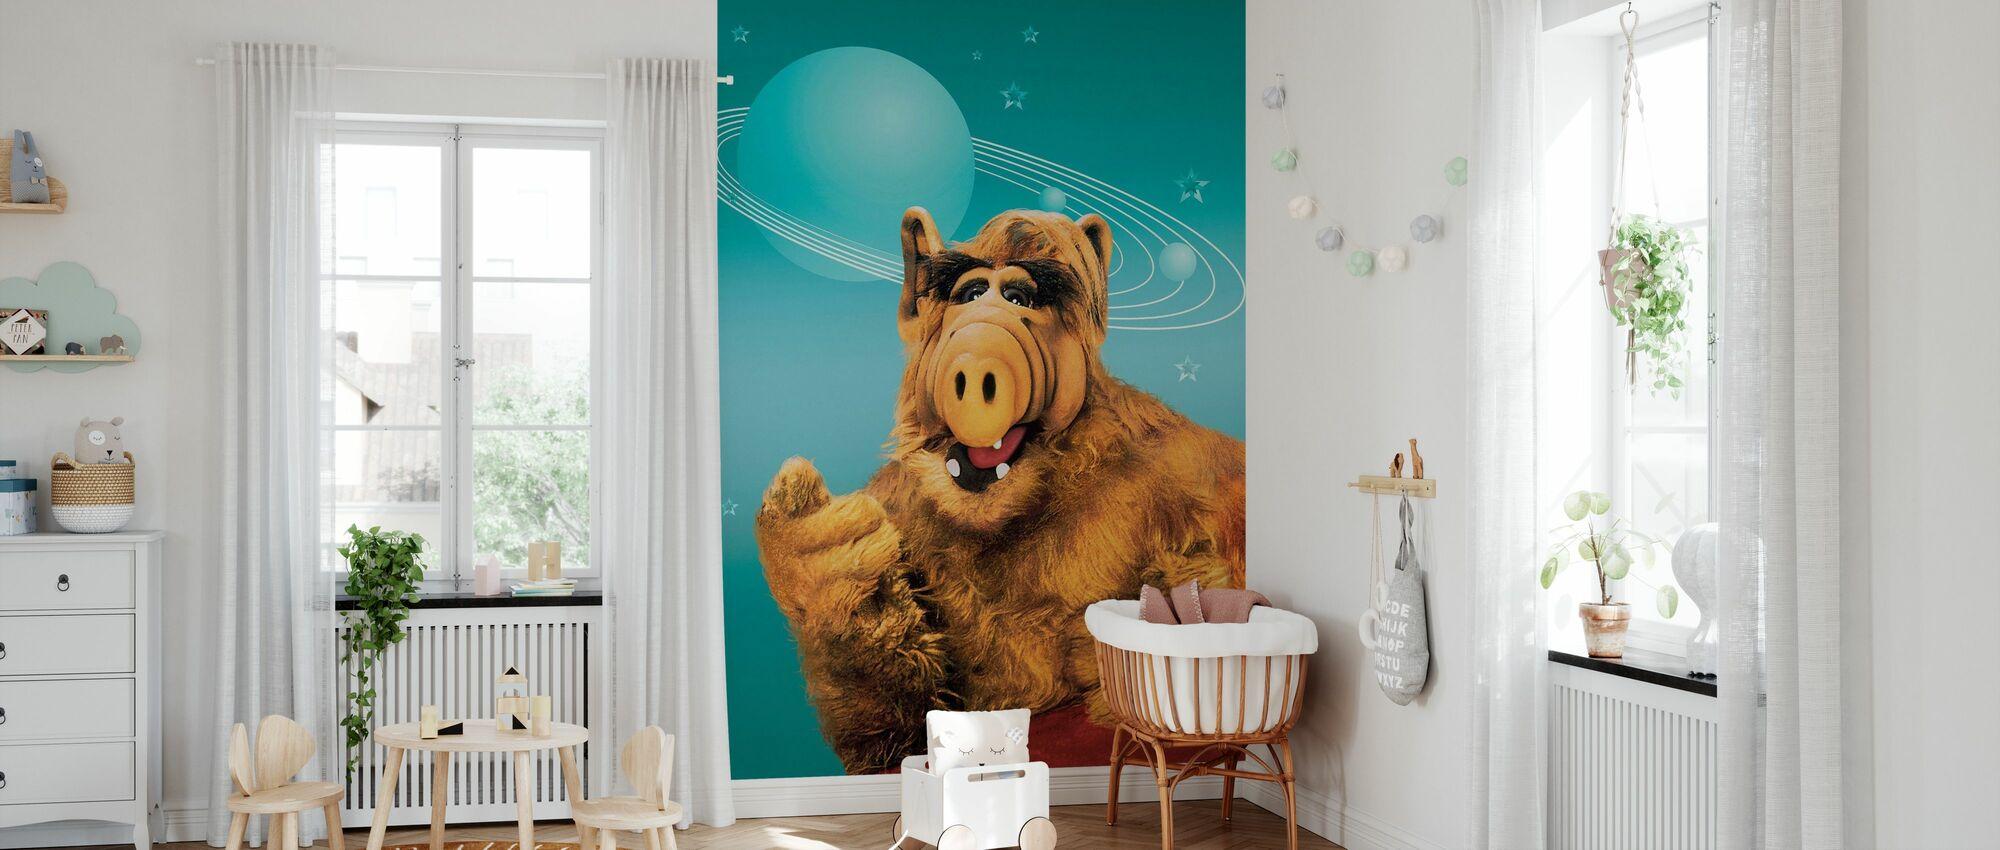 Alf - Paul Fusco en Tom Patchett - Behang - Babykamer